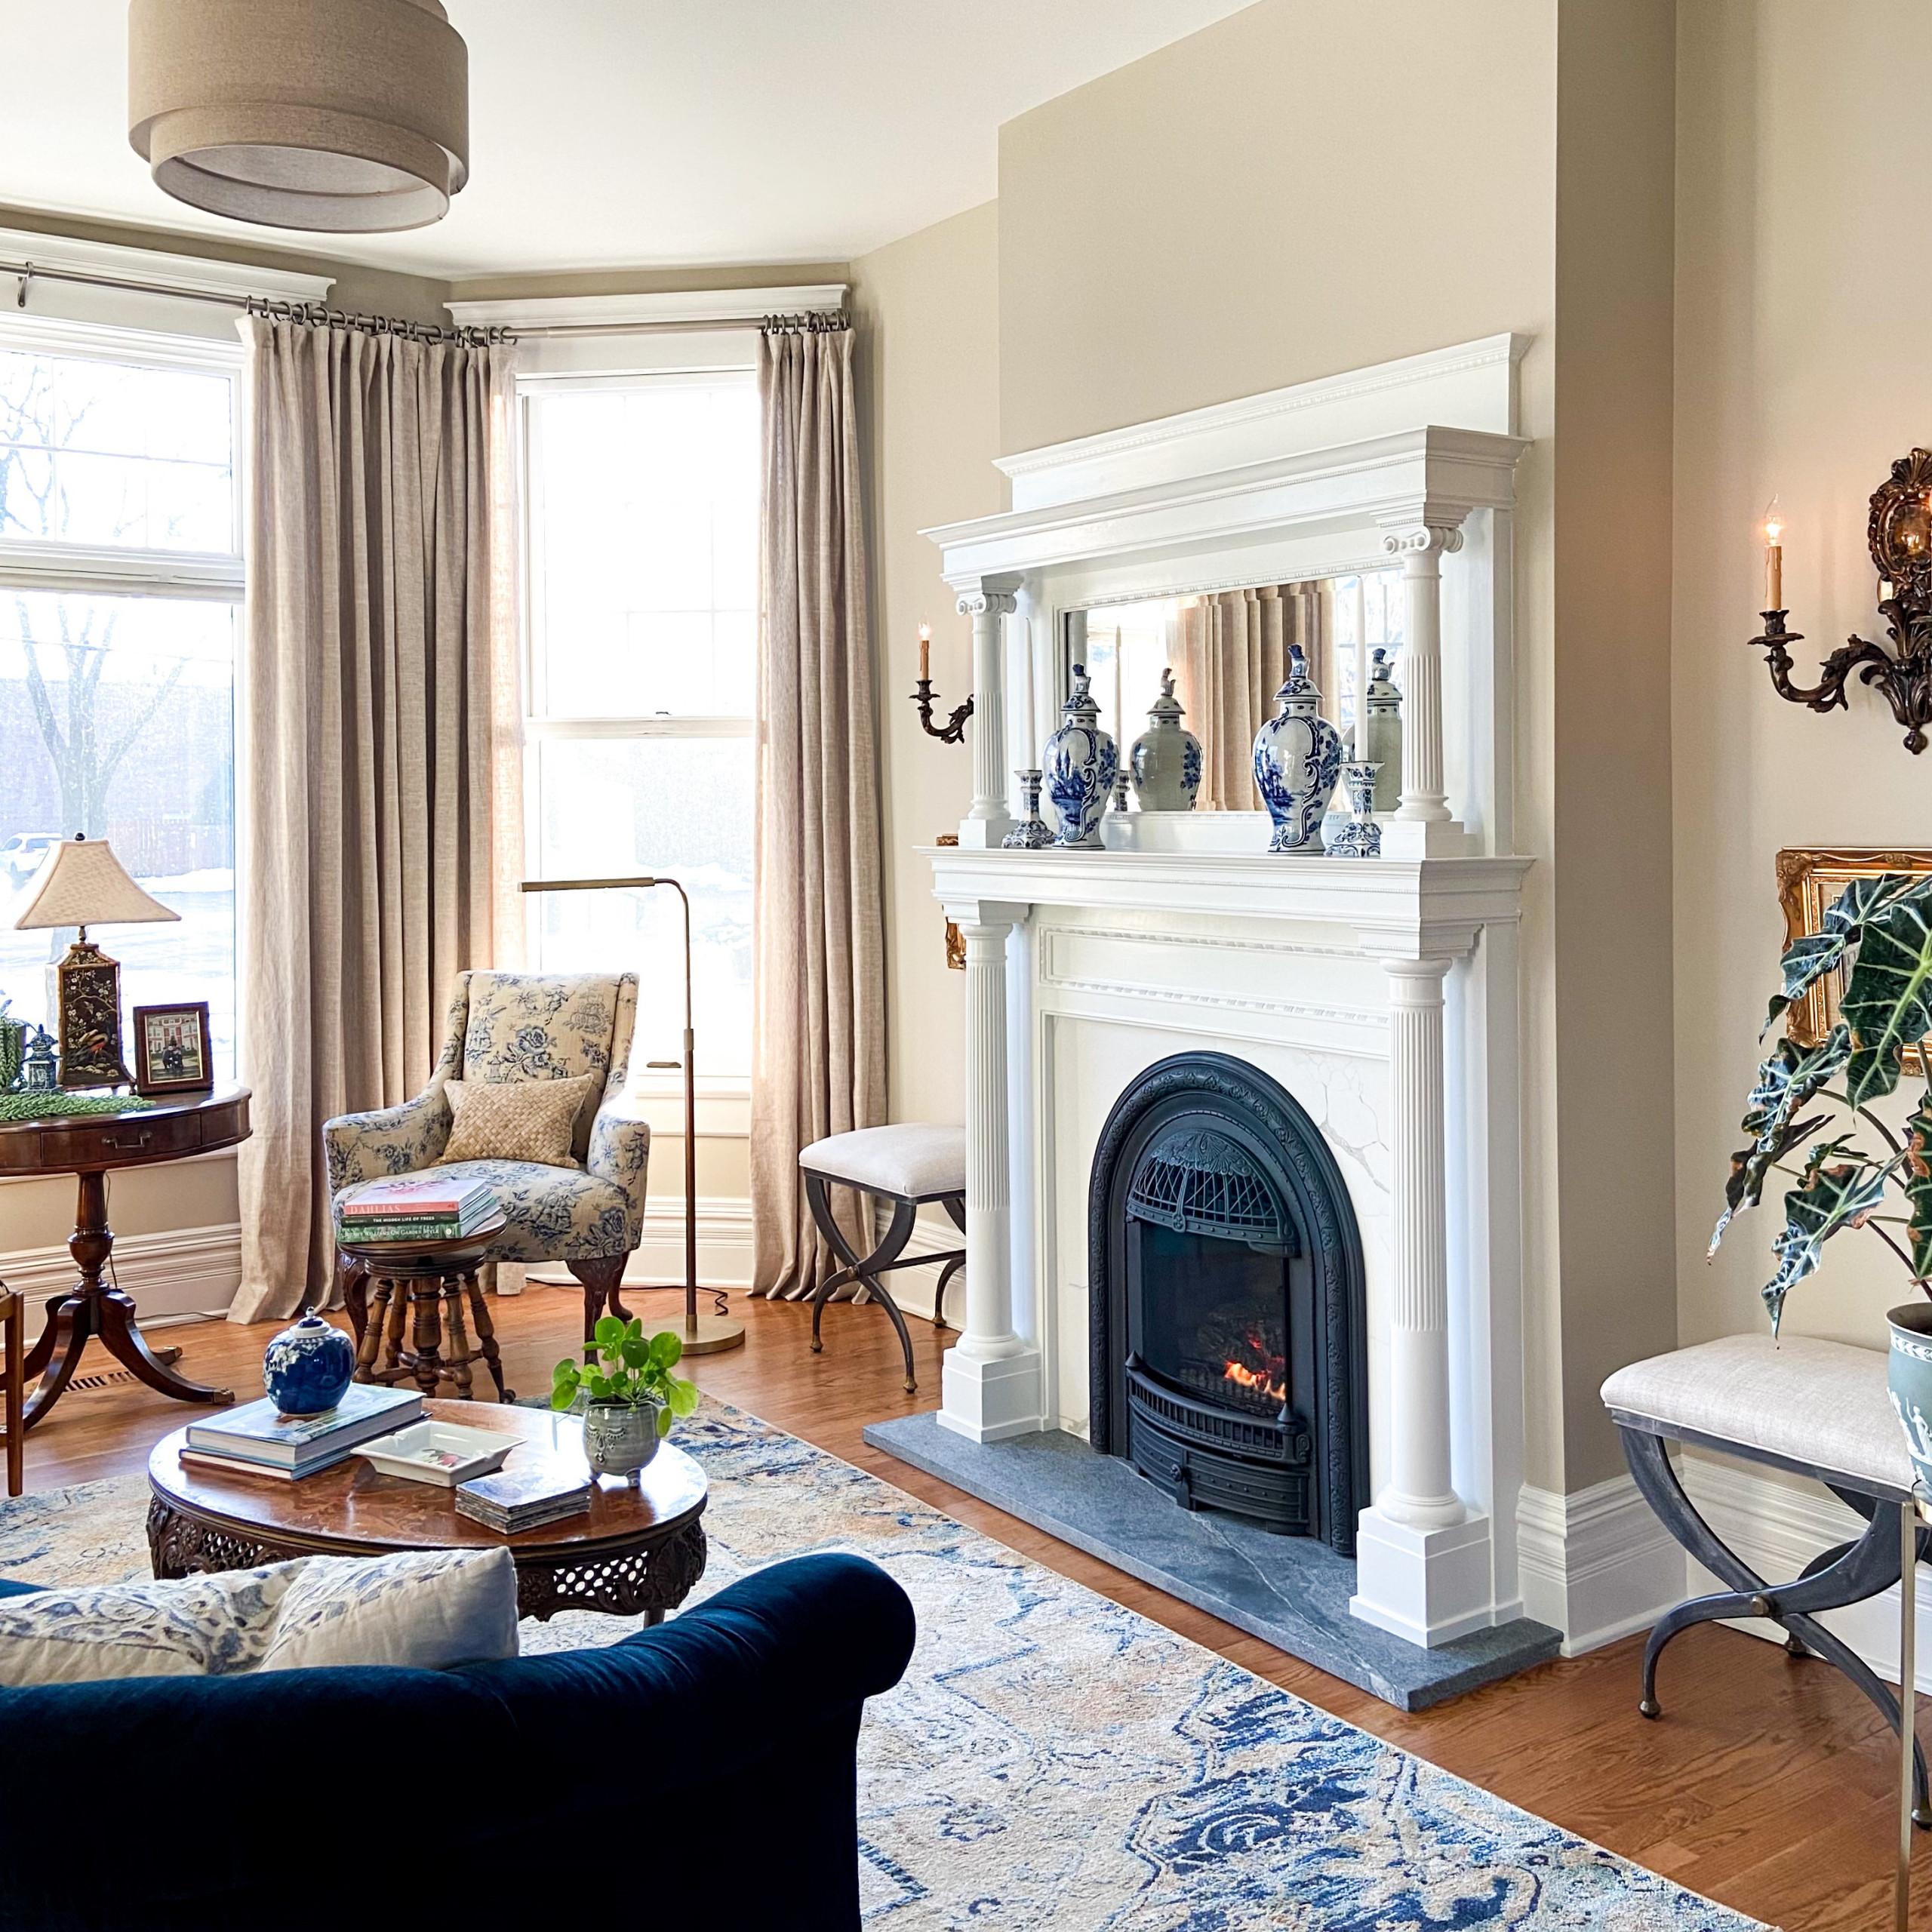 Plum Grove 1885 Fireplace